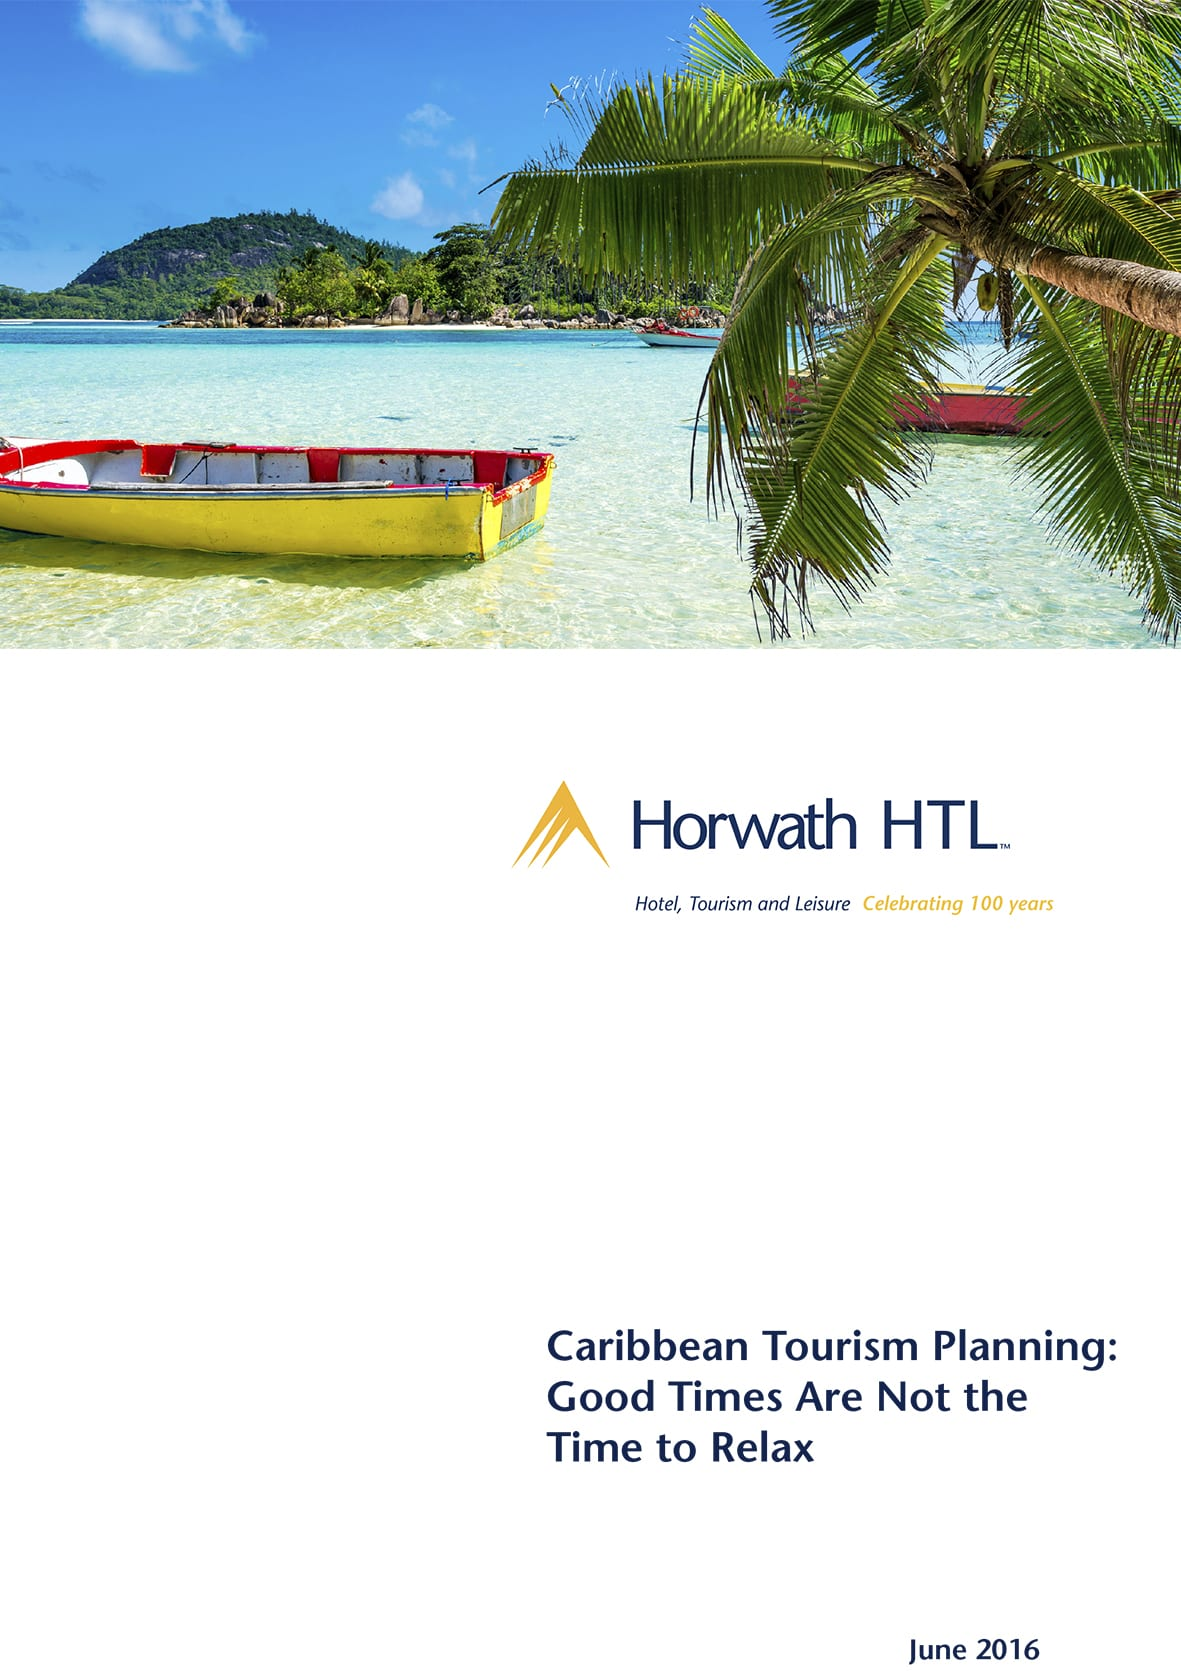 Caribbean Tourism Planning 1